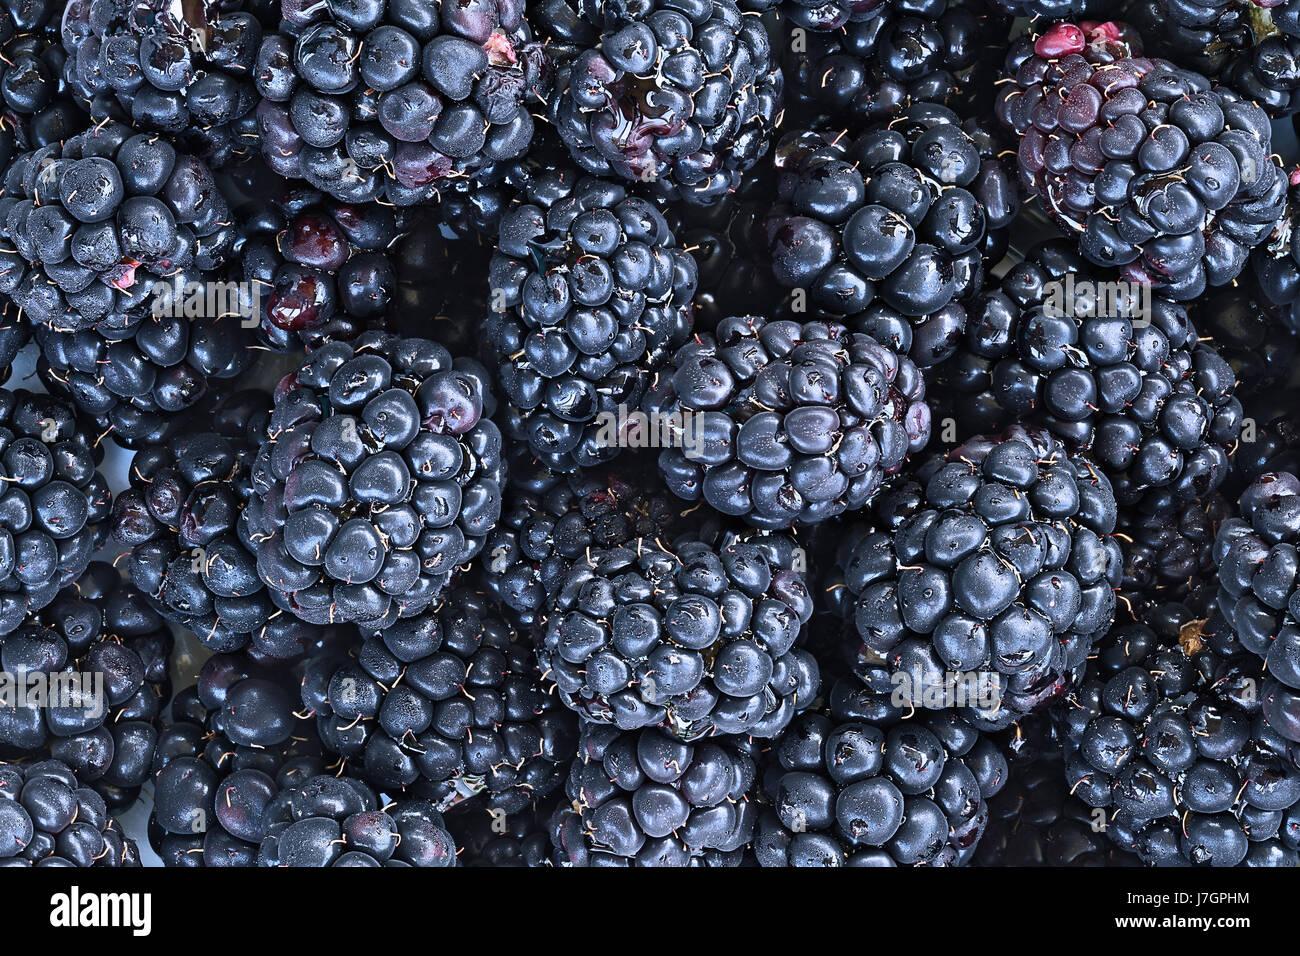 Full frame background of juicy raw blackberry fruit. - Stock Image